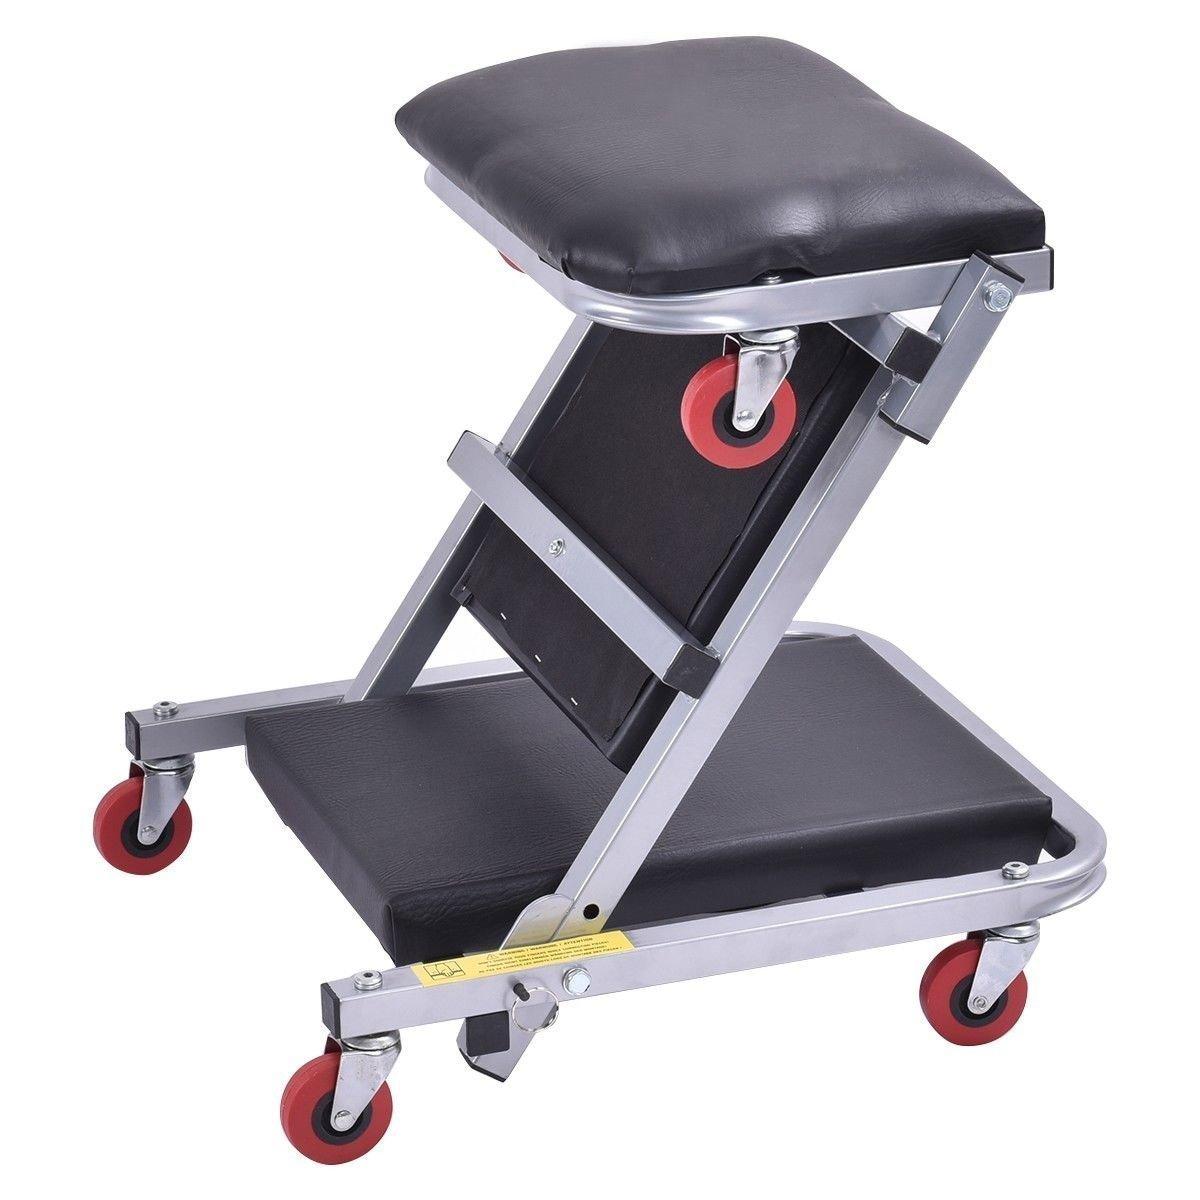 Goplus 40  Foldable Z Creeper Seat Rolling Chair Mechanics Garage 2 In 1 Work Stool  sc 1 st  Amazon.com & Amazon.com: Roller Seats u0026 Creepers - Garage u0026 Shop: Automotive ... islam-shia.org